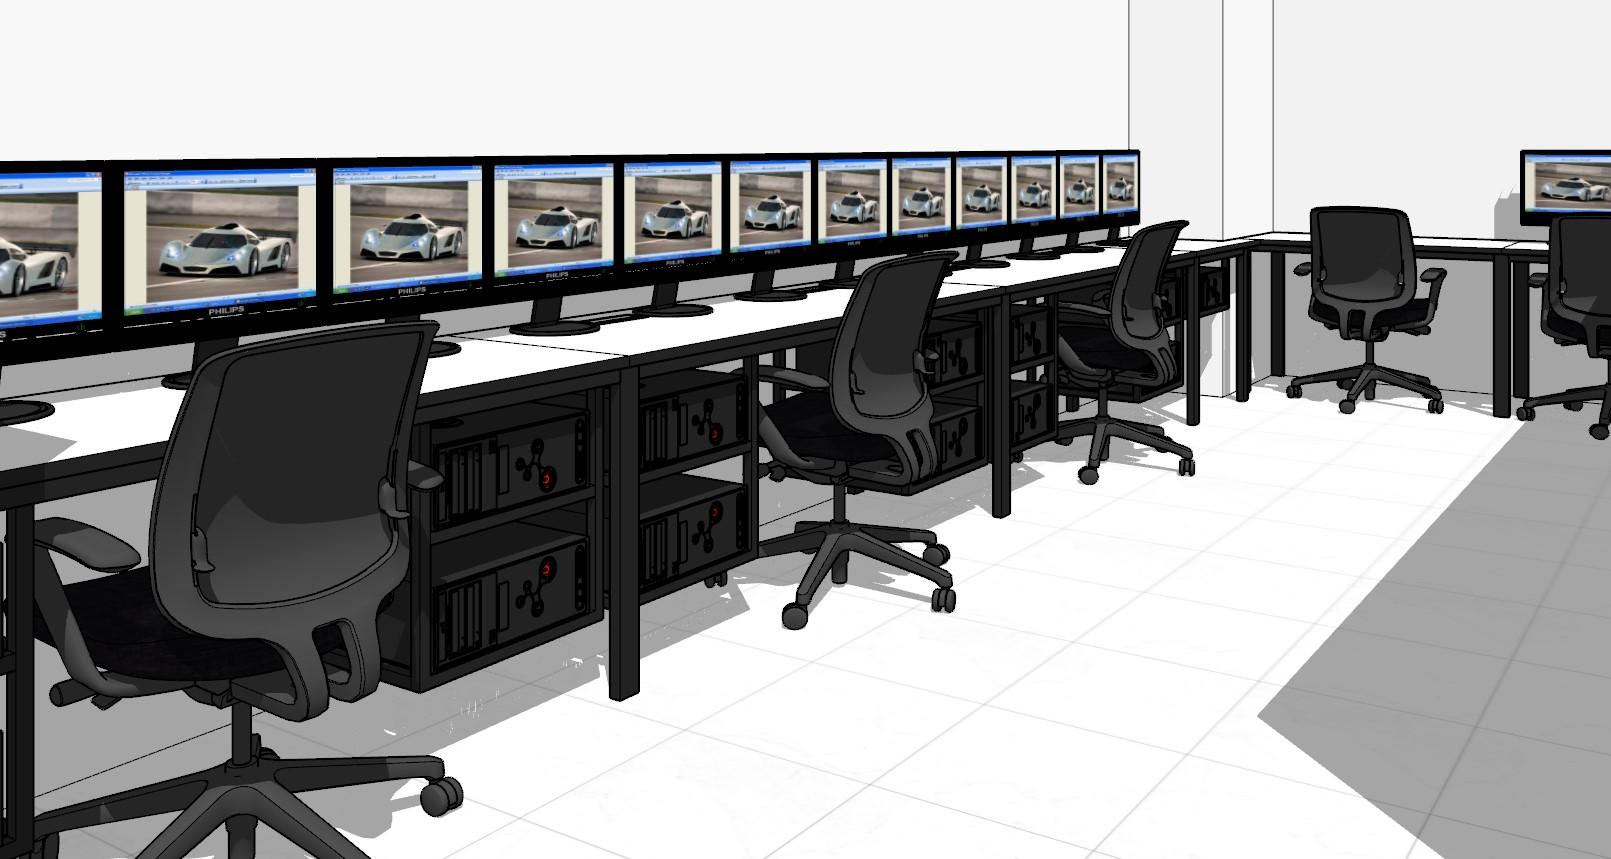 CAD绘图家具设计效果图三维摆放建模布置图家三维cad图户型图片